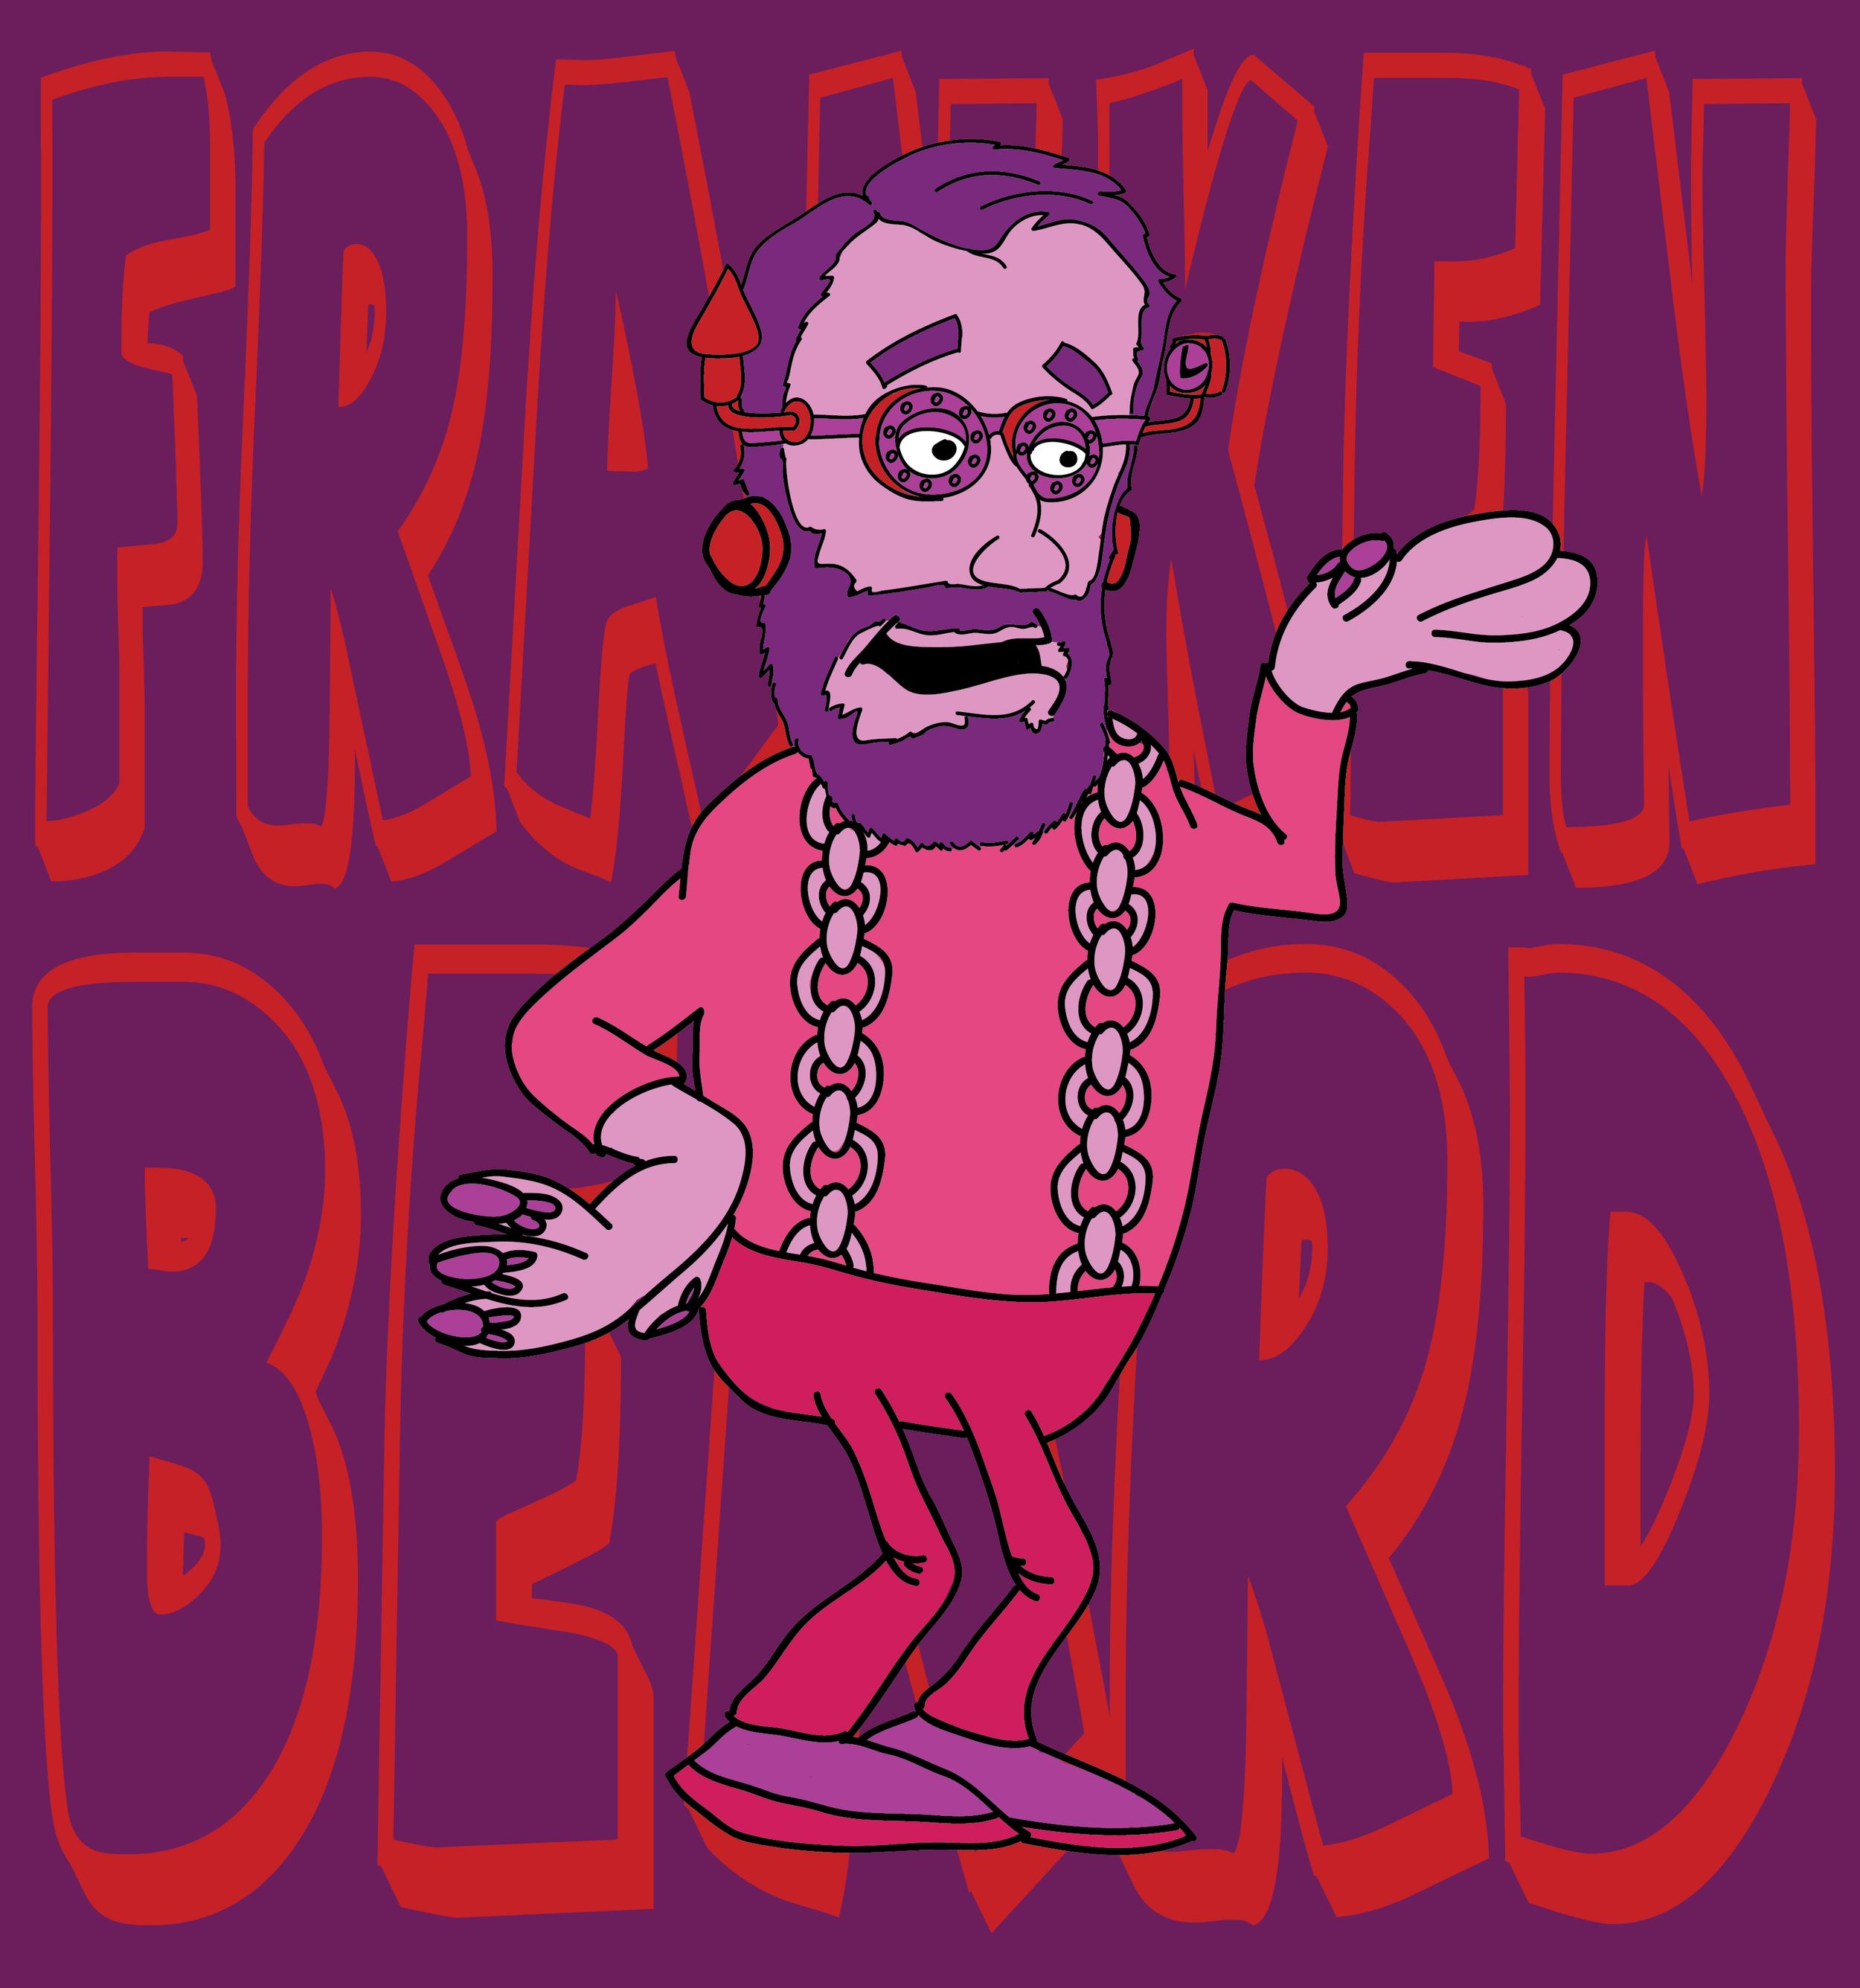 Halloween 2012 - FrankenBeard.png